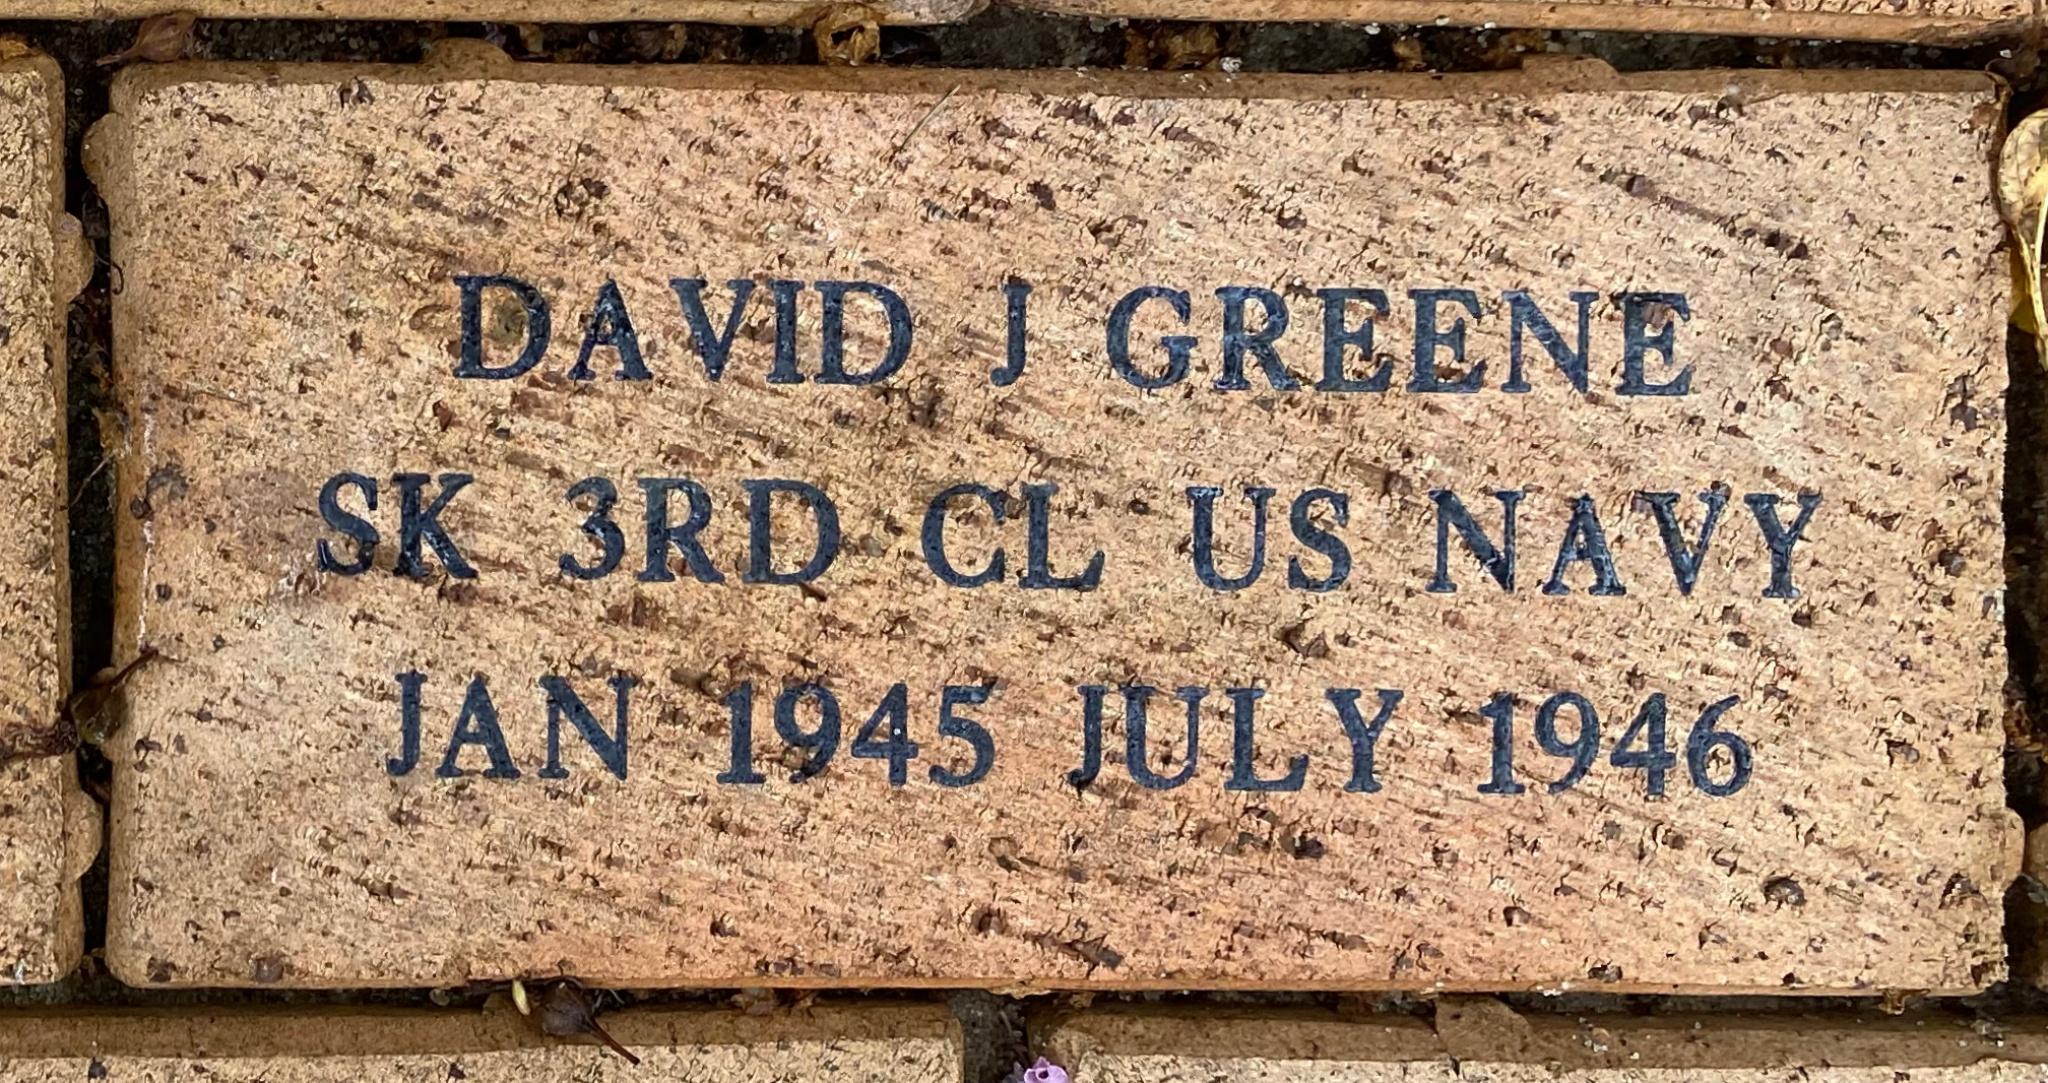 DAVID J GREENE SK 3RD CL US NAVY JAN 1945JULY 1946